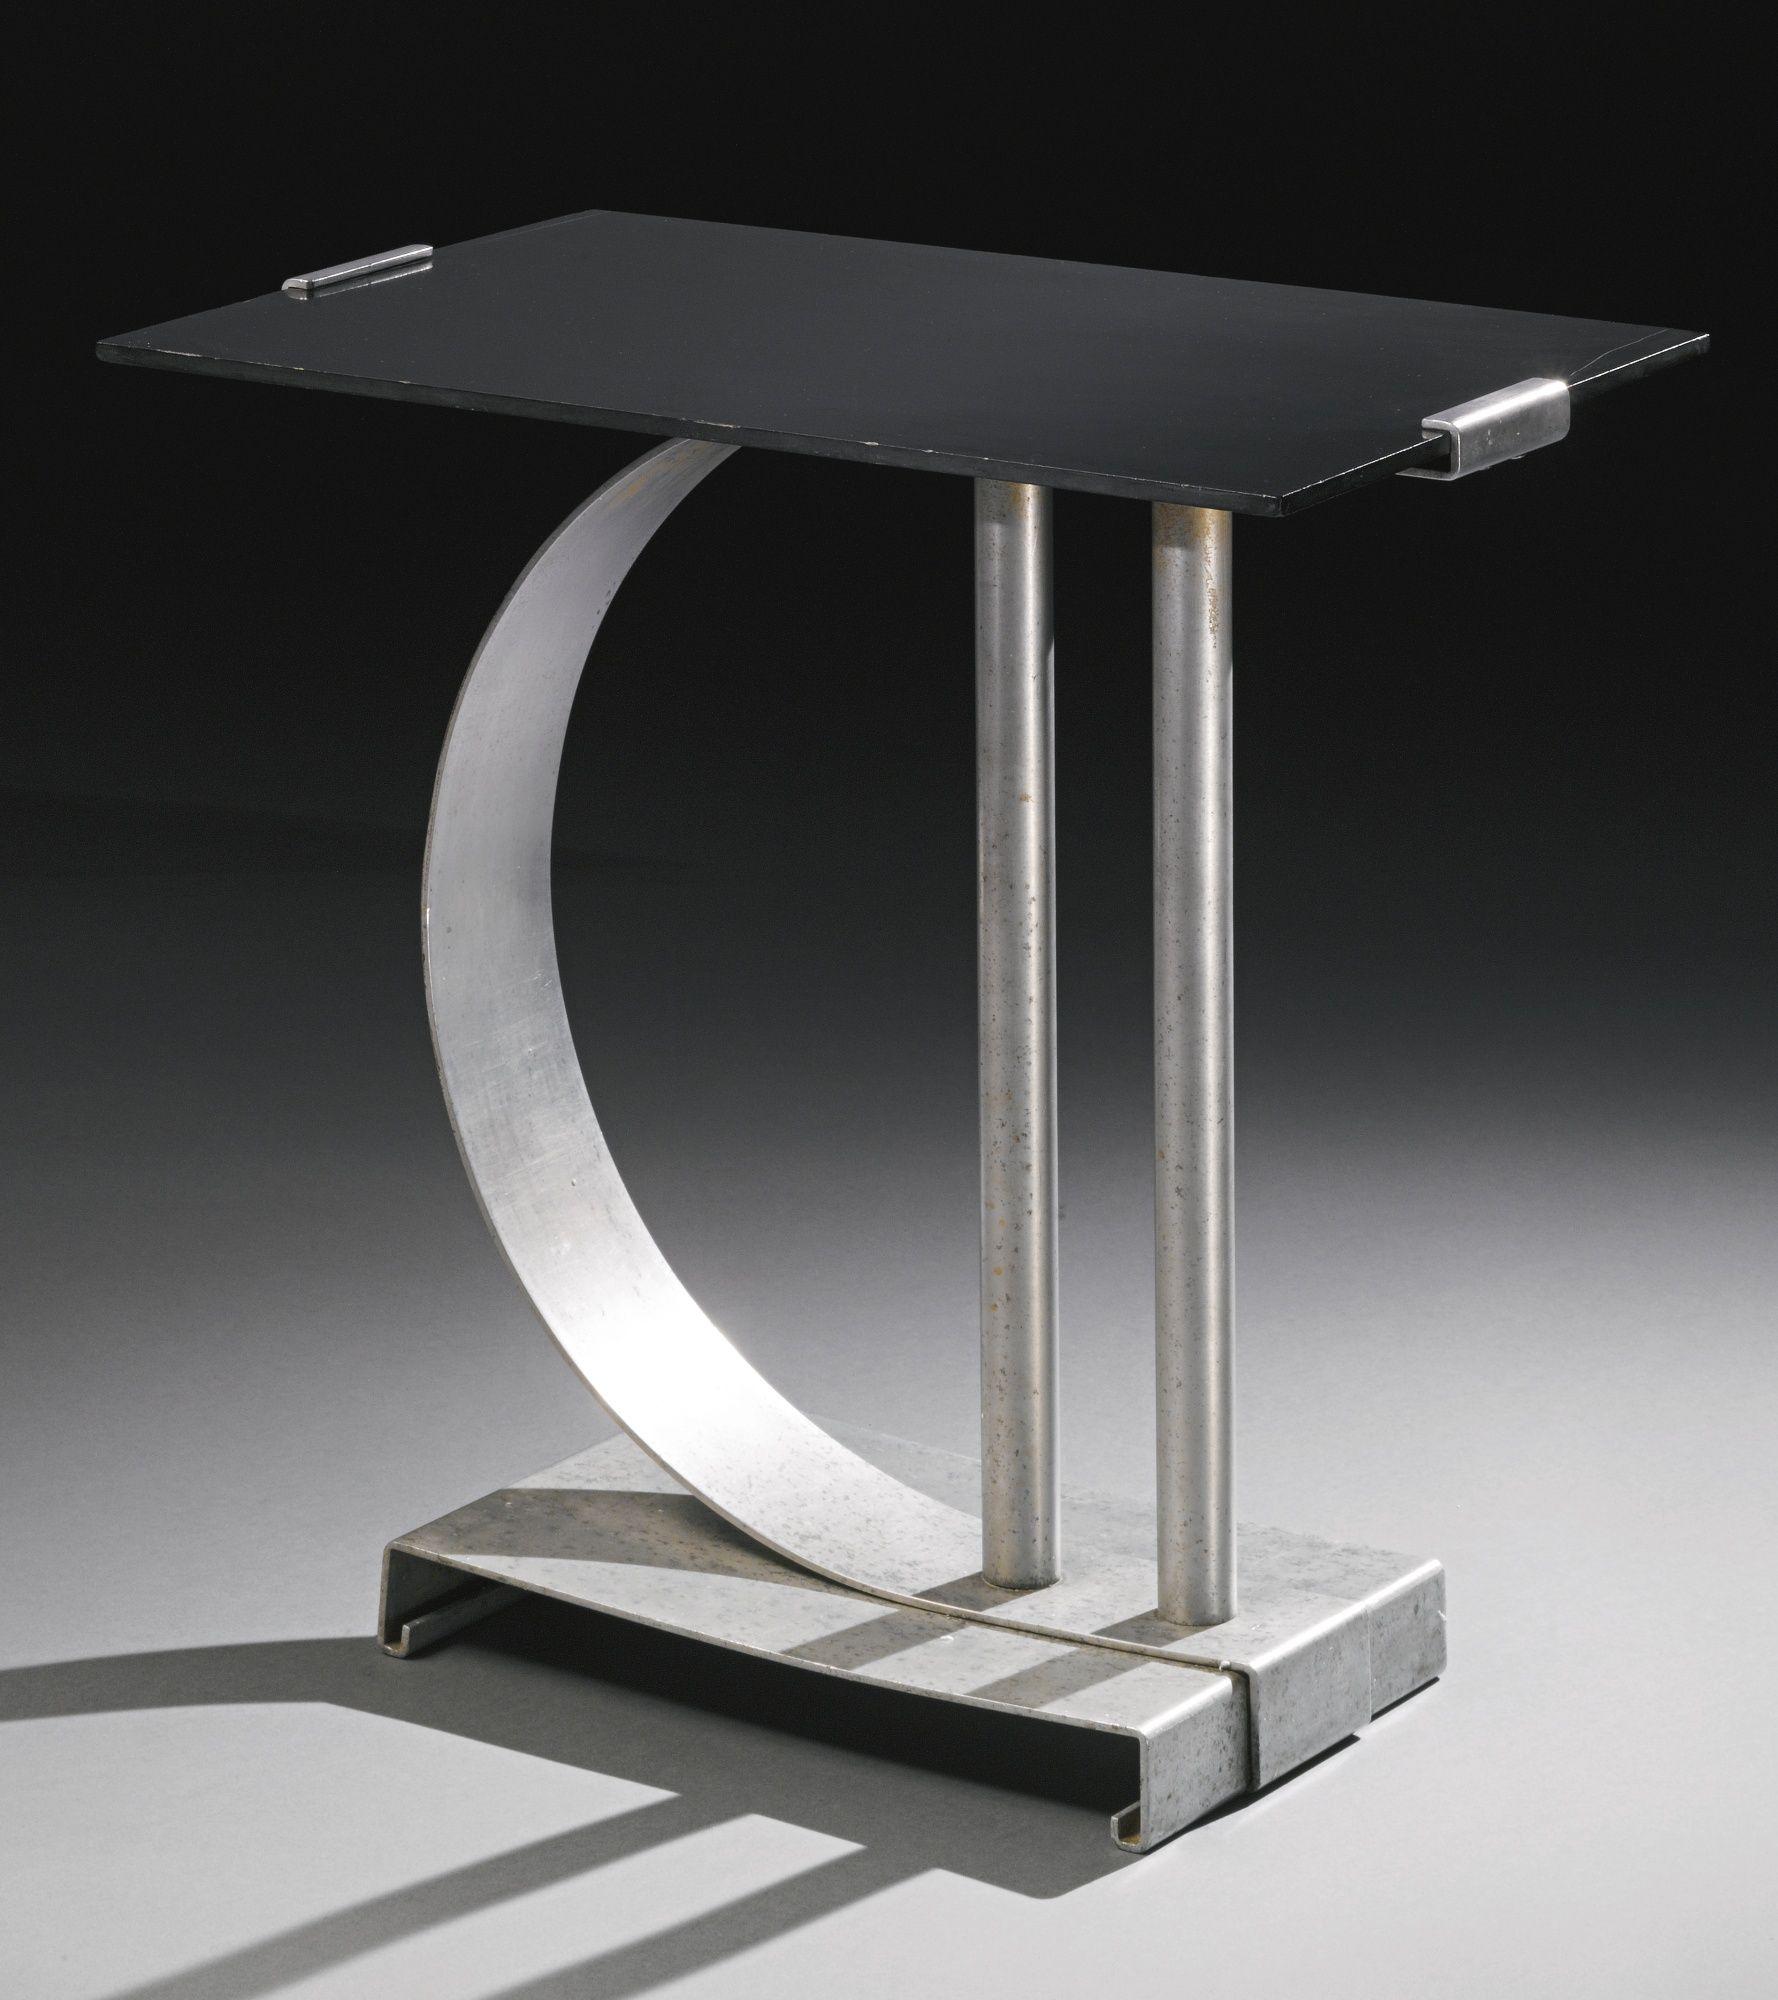 Walter Von Nessen Table Model No 451 Impressed Nessen Studio  # Muebles Bauhaus Caracteristicas